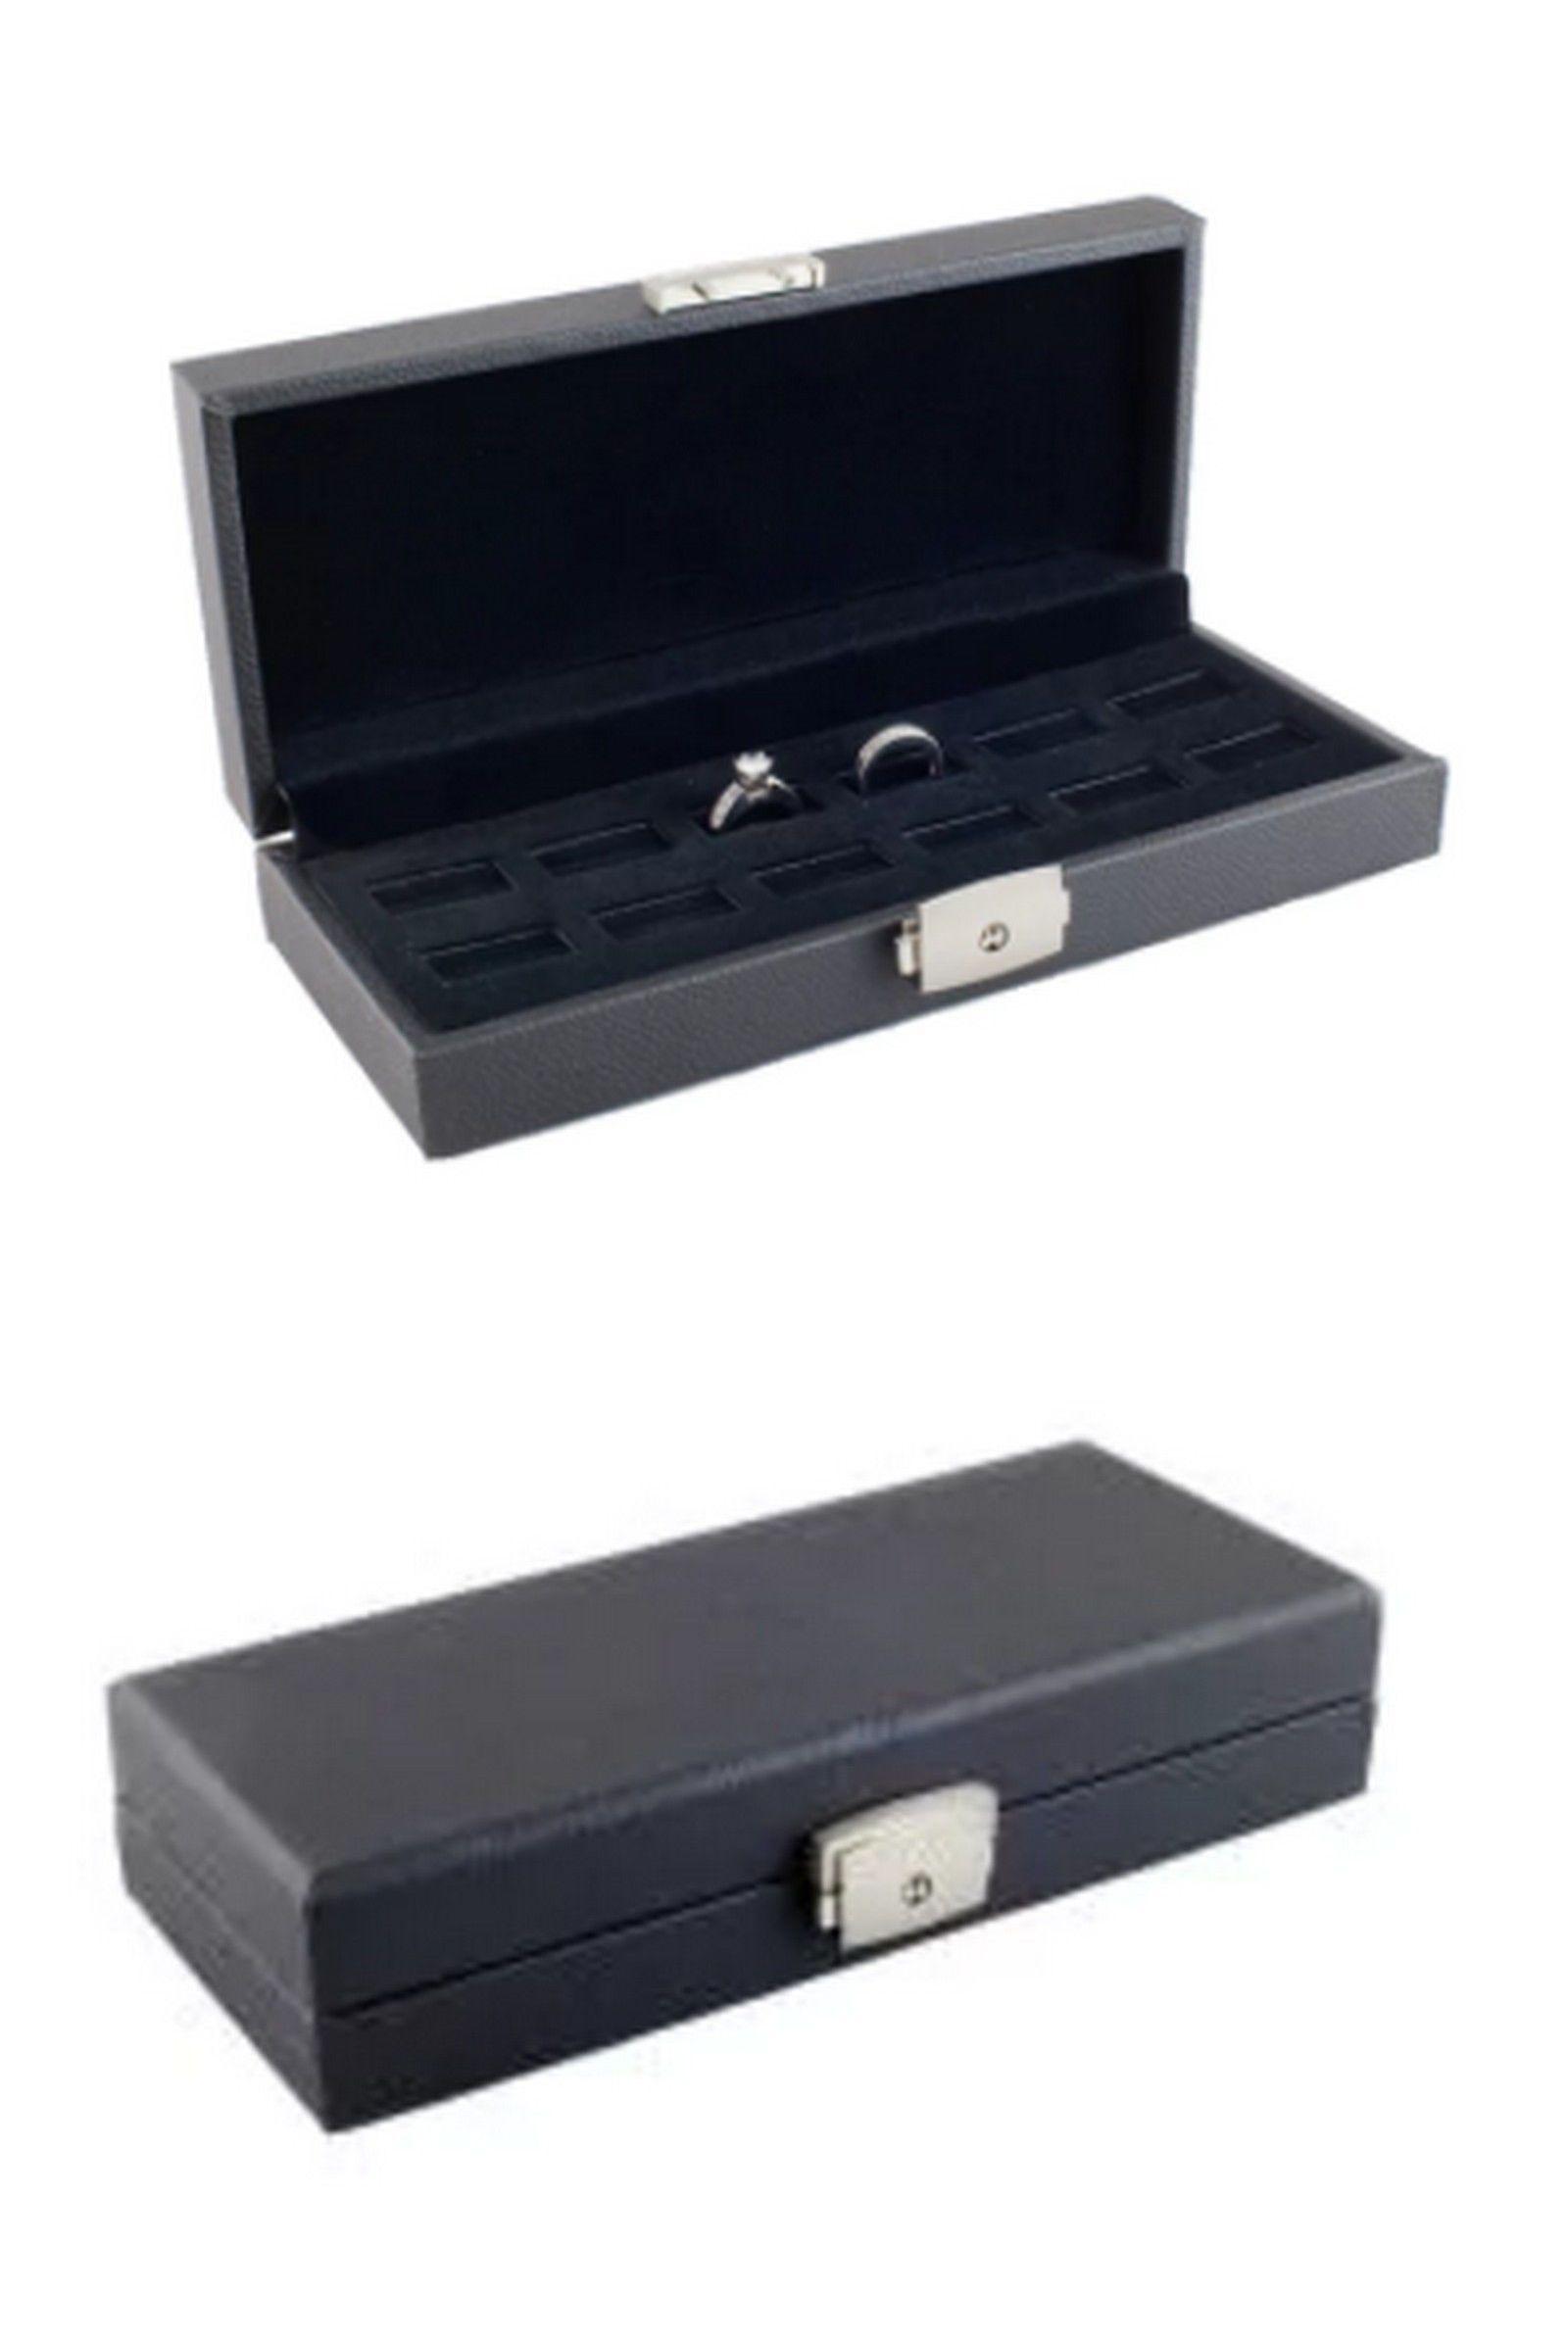 Ring 168163 Jewelry Box Ring Display Case Organizer Storage Holder